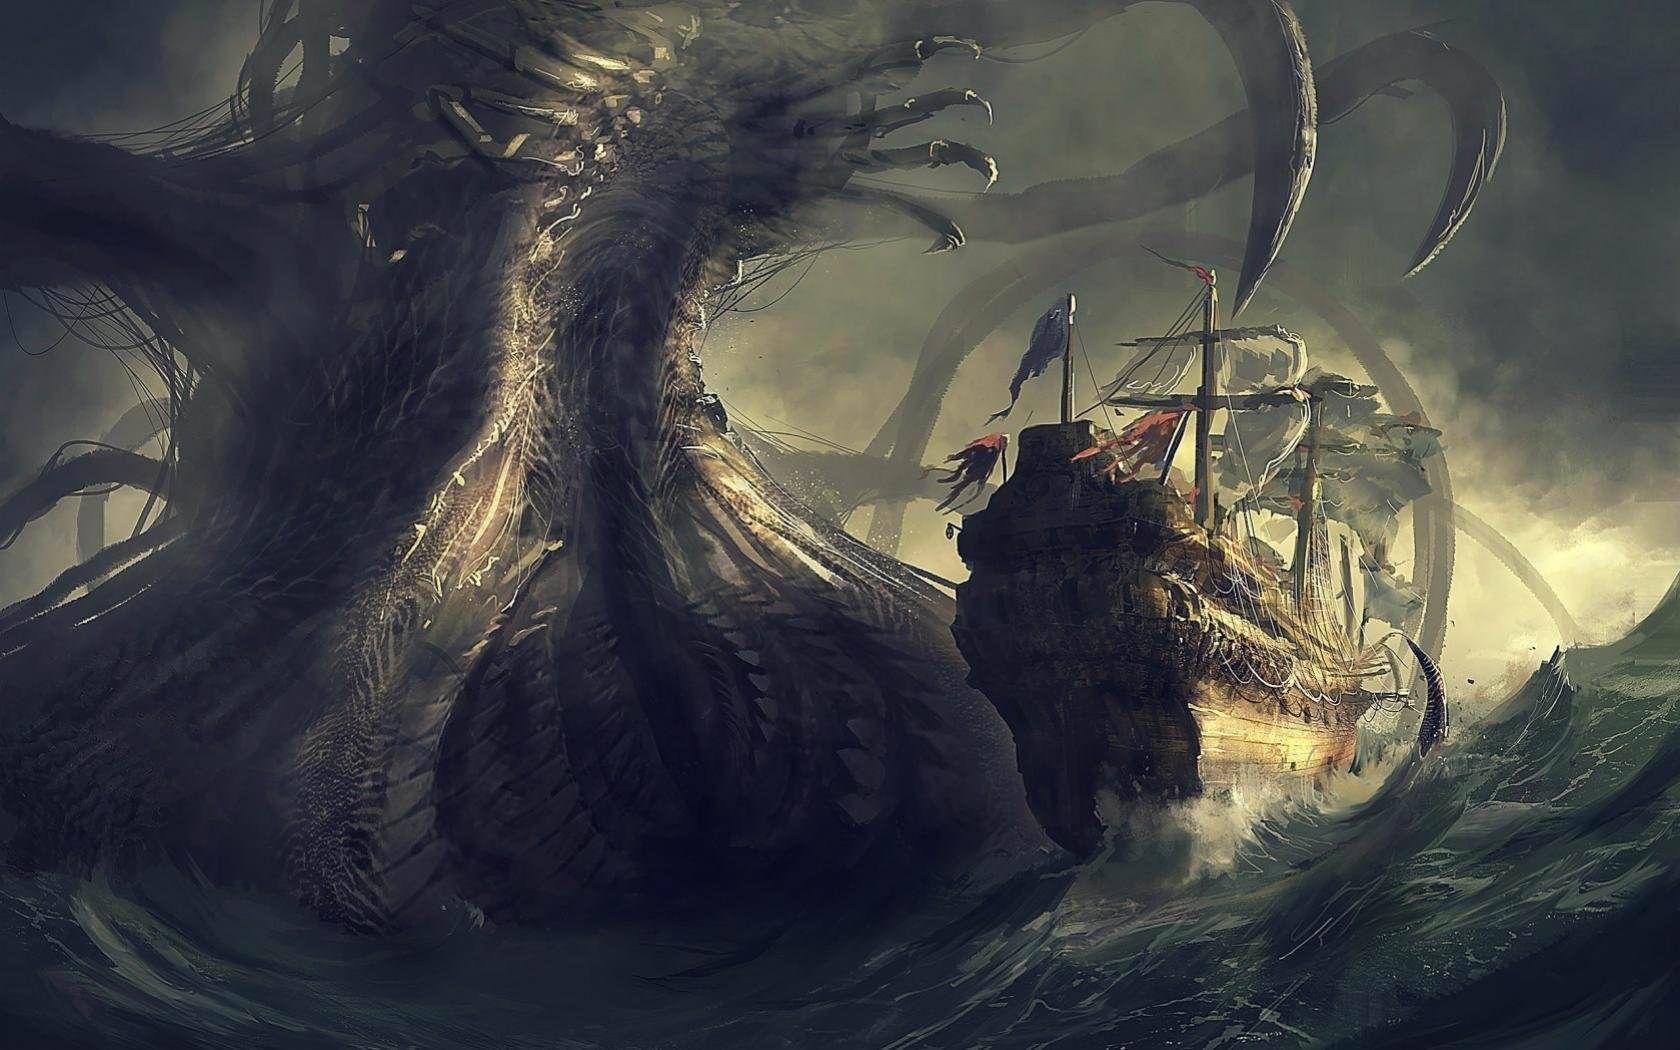 Sea Monster 16801050 Hdwallpaper Wallpaper Image Sea Monsters Water Illustration Old Sailing Ships